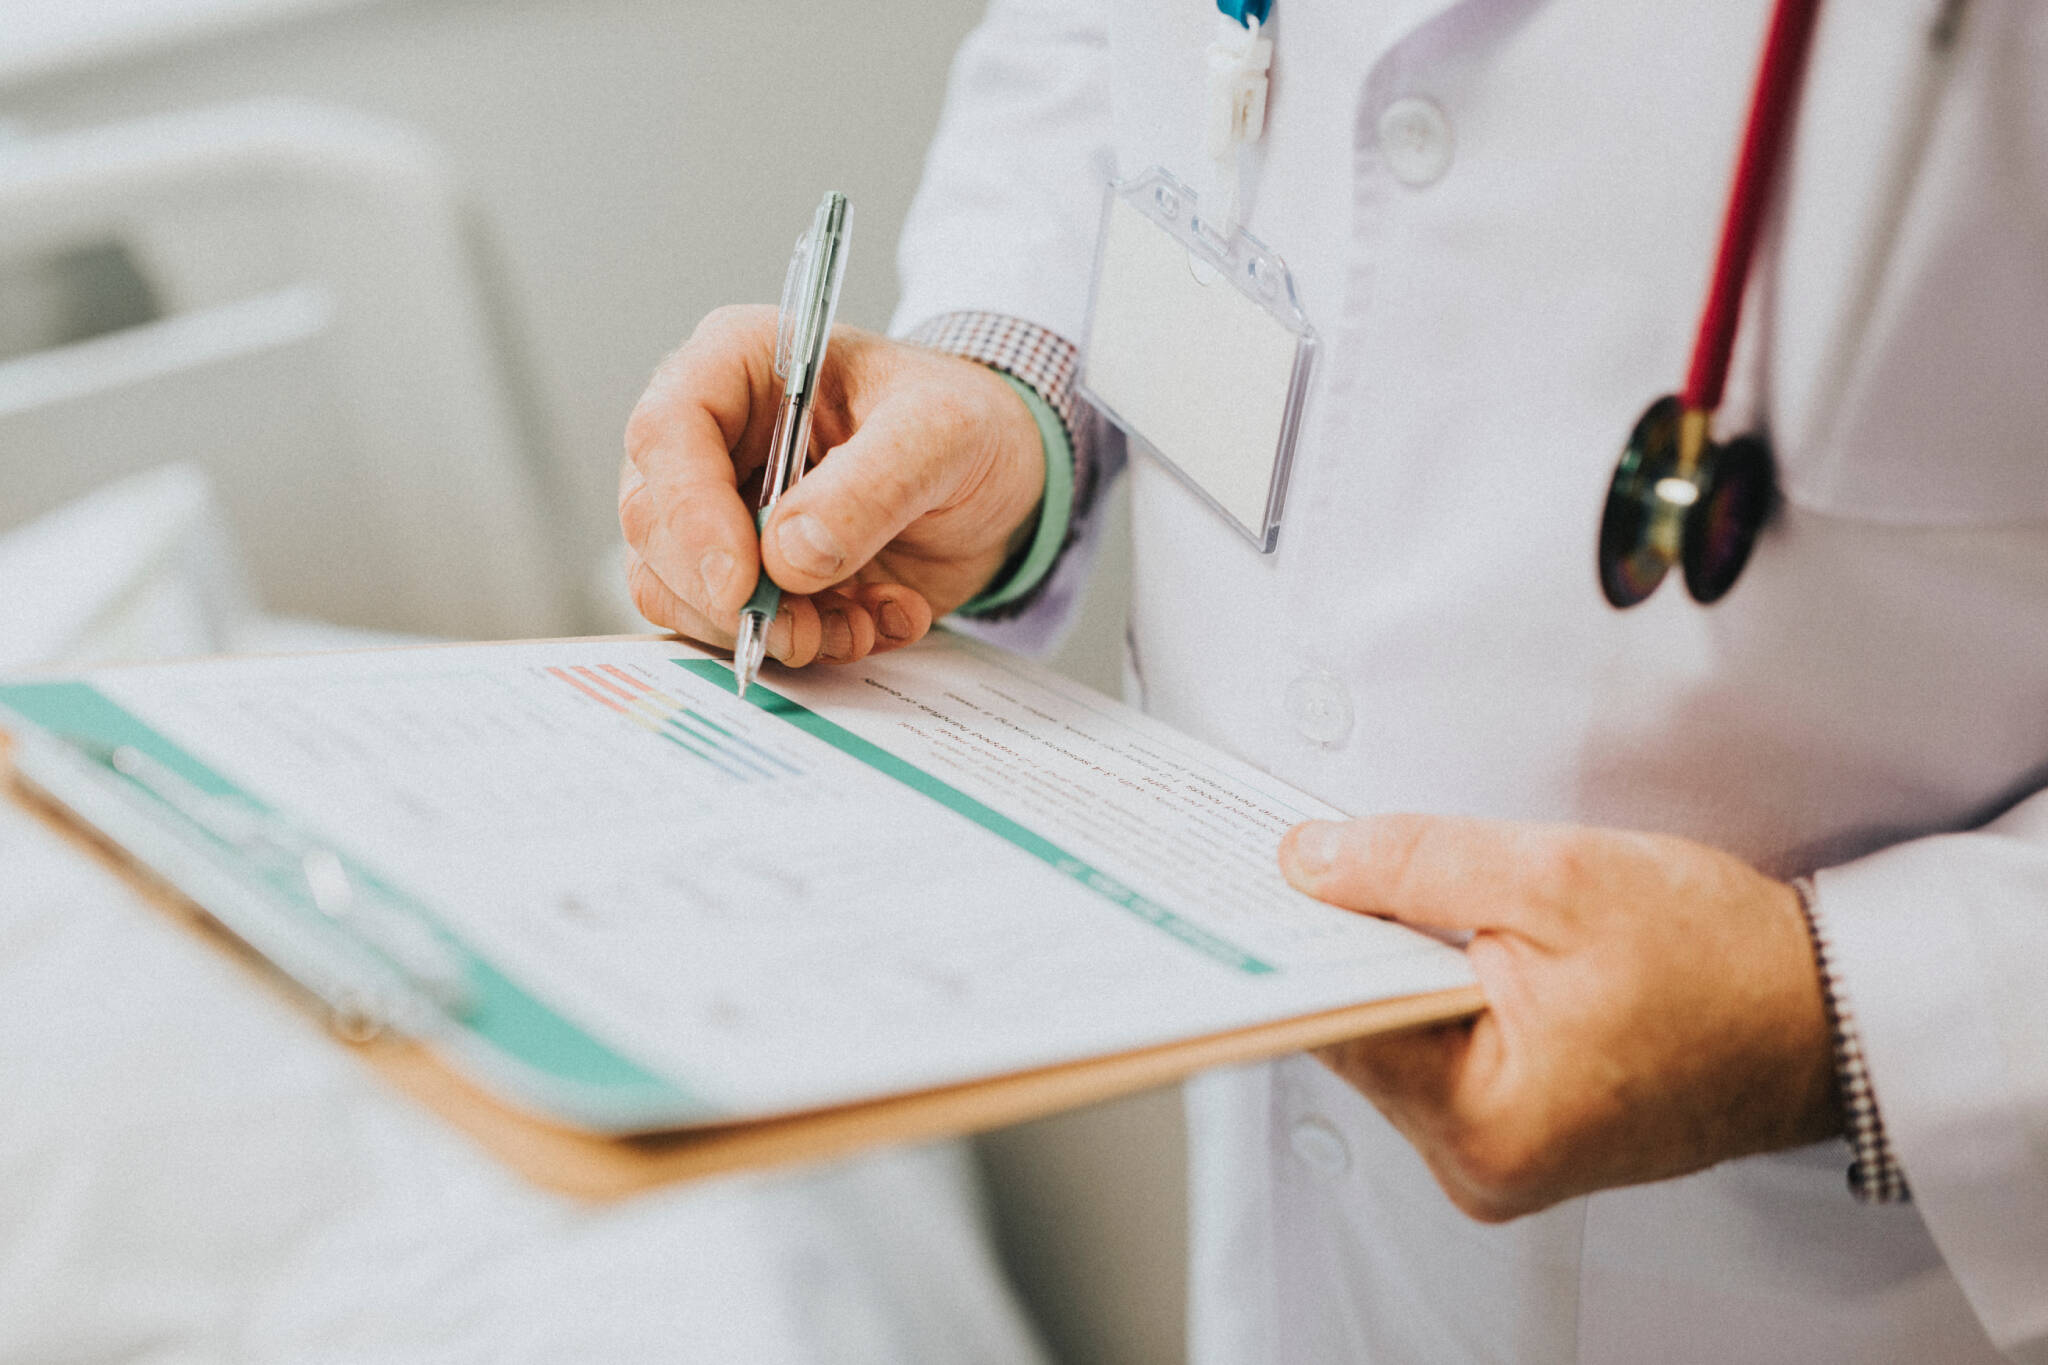 toronto public health cuts